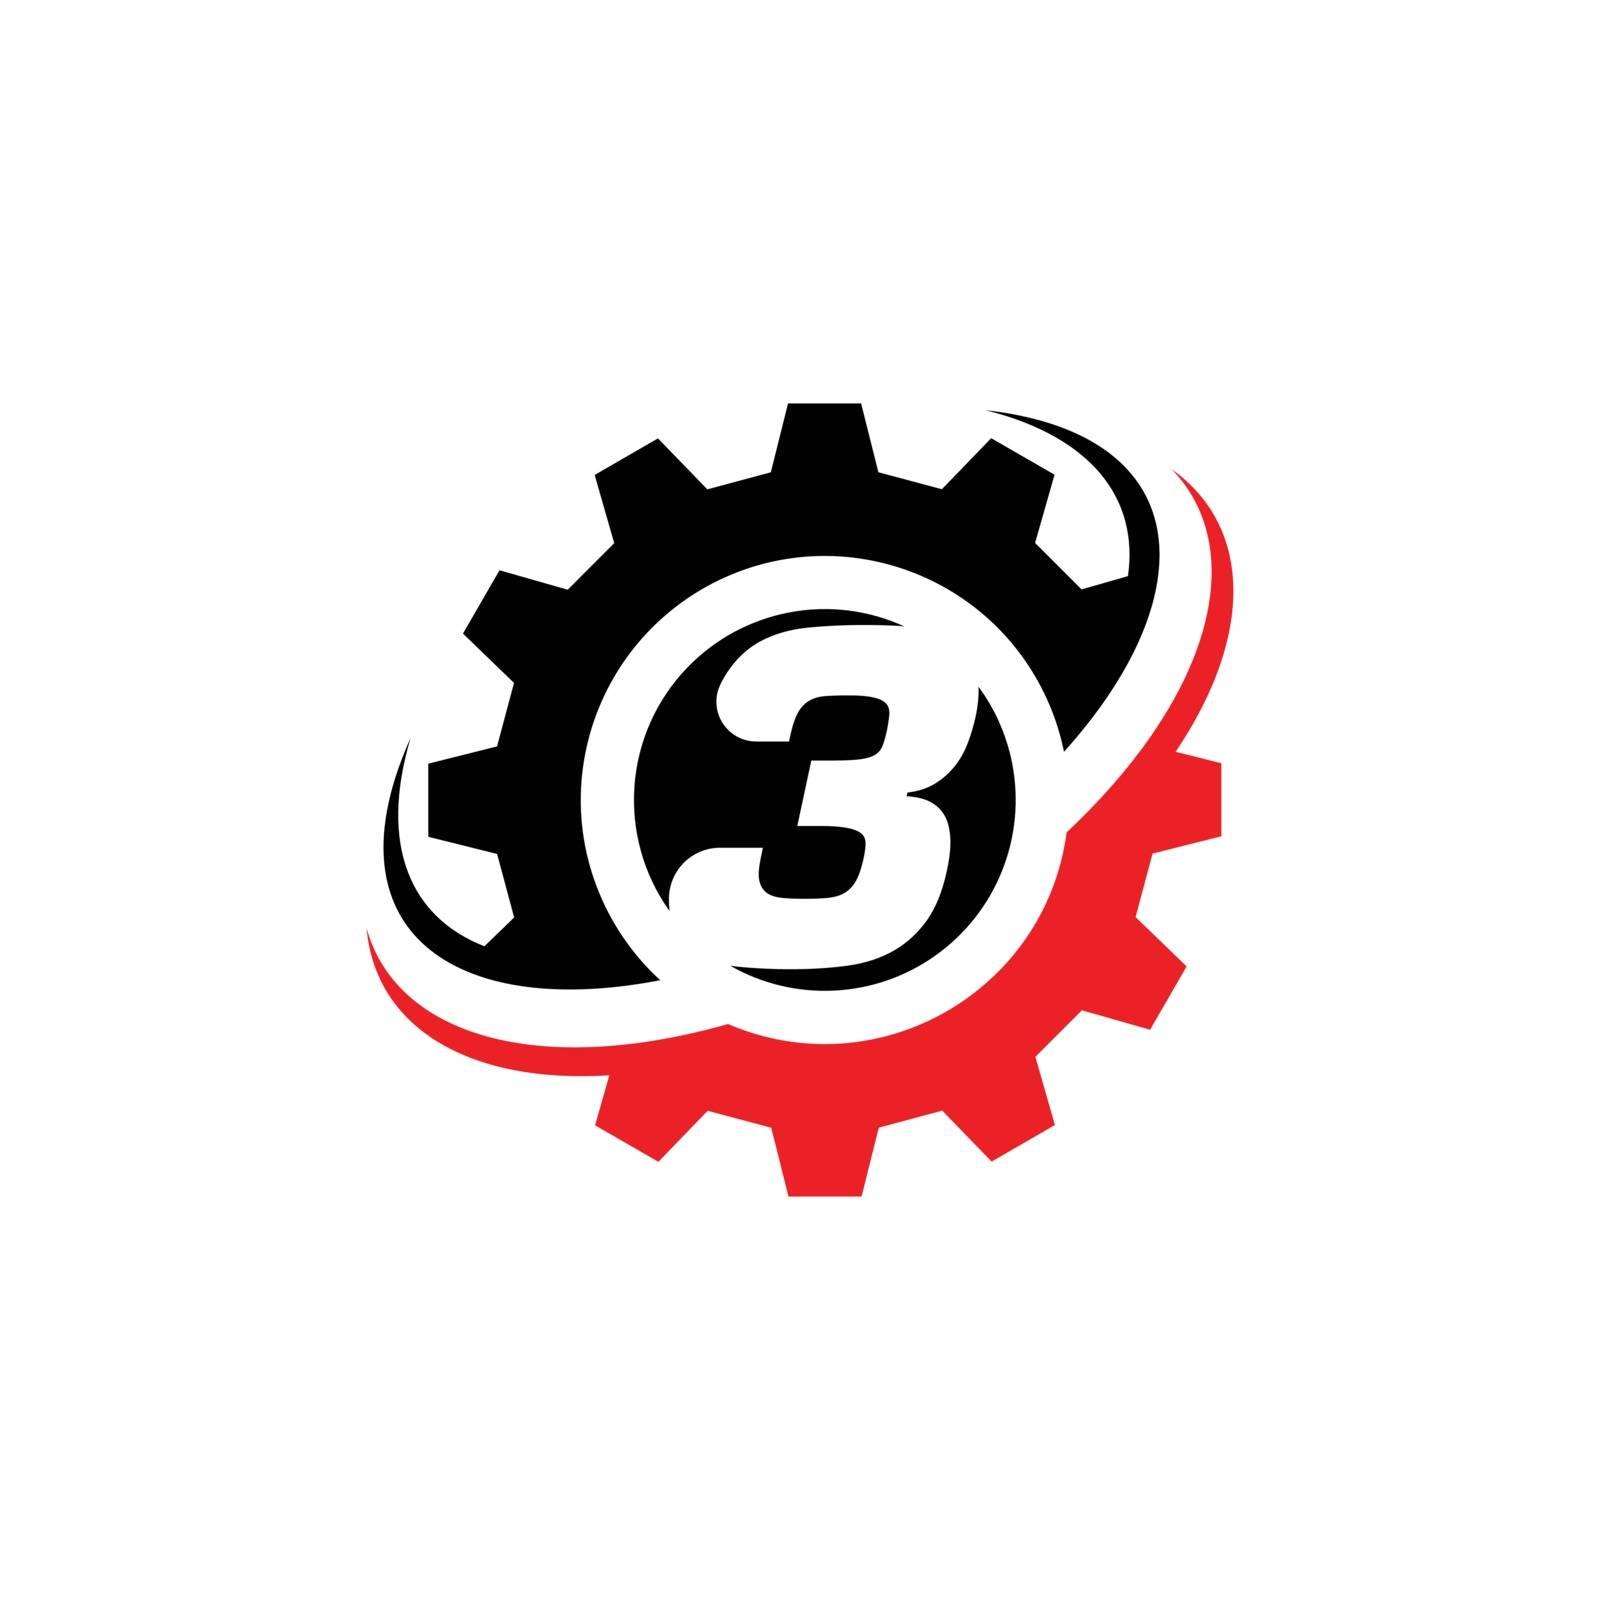 Number 3 Gear Logo Design Template